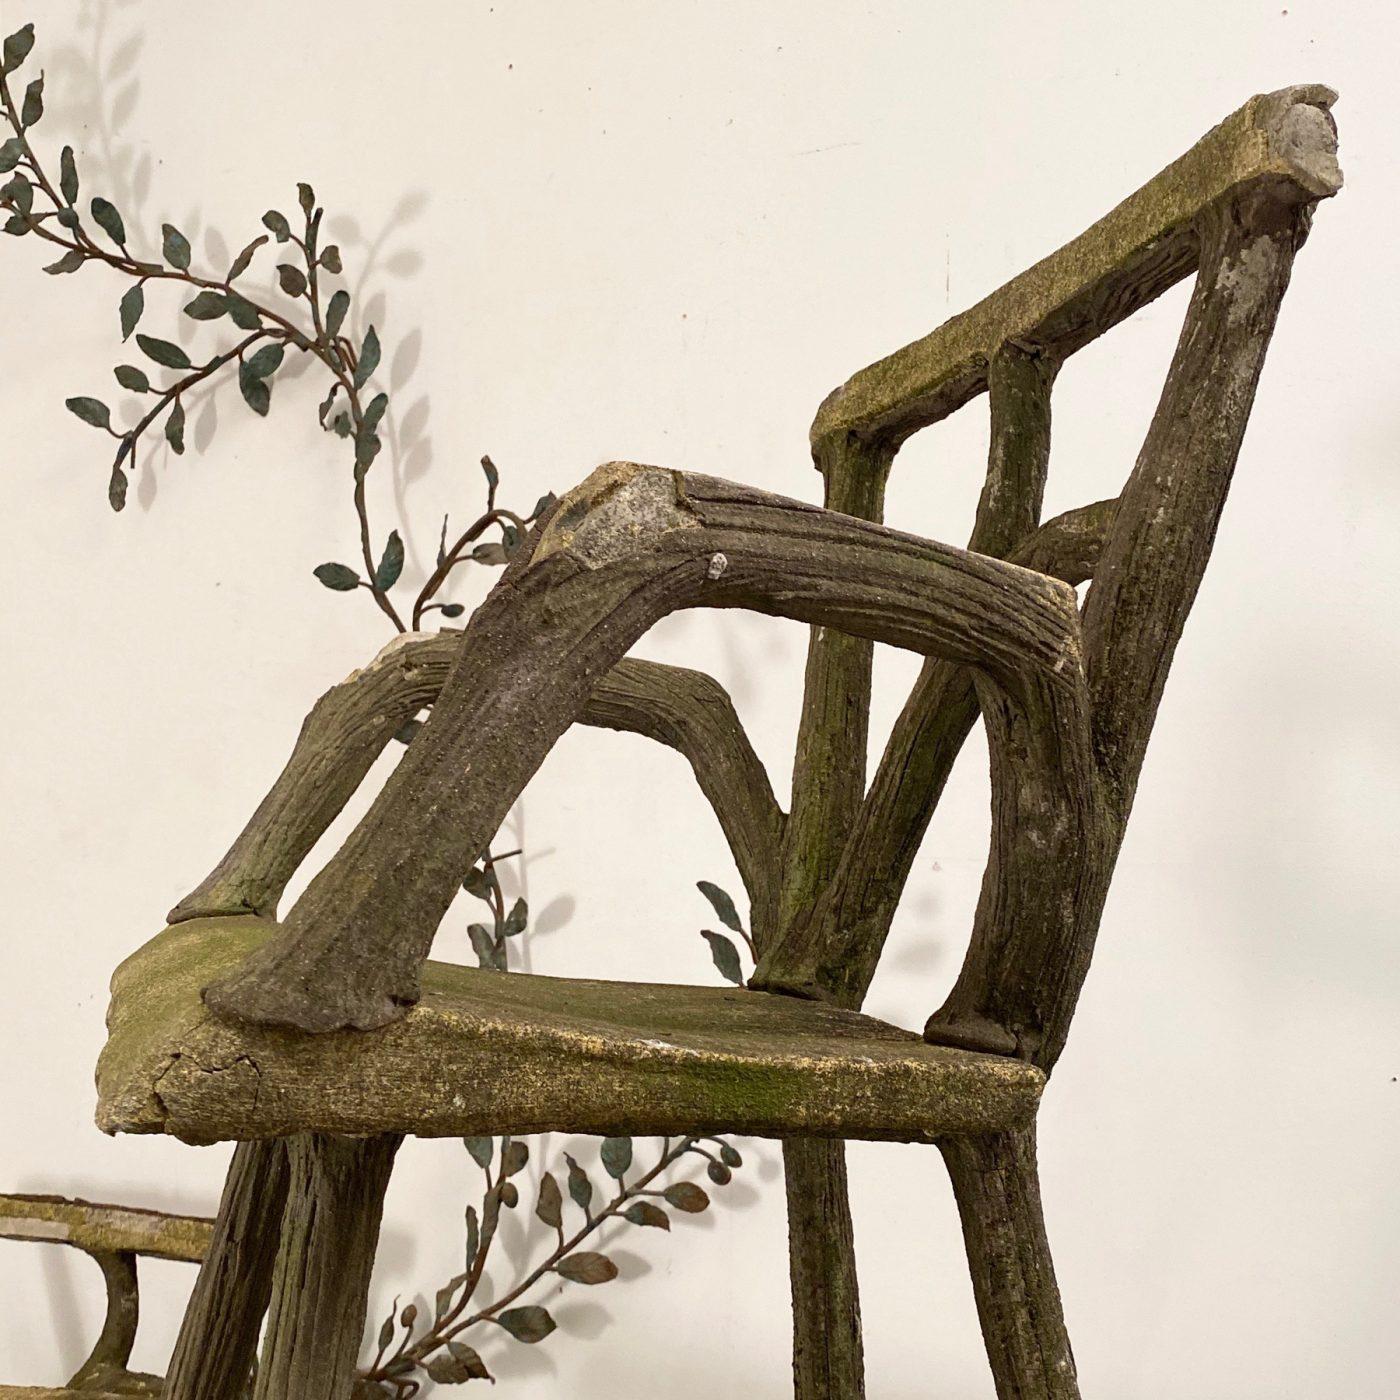 objet-vagabond-garden-set0003